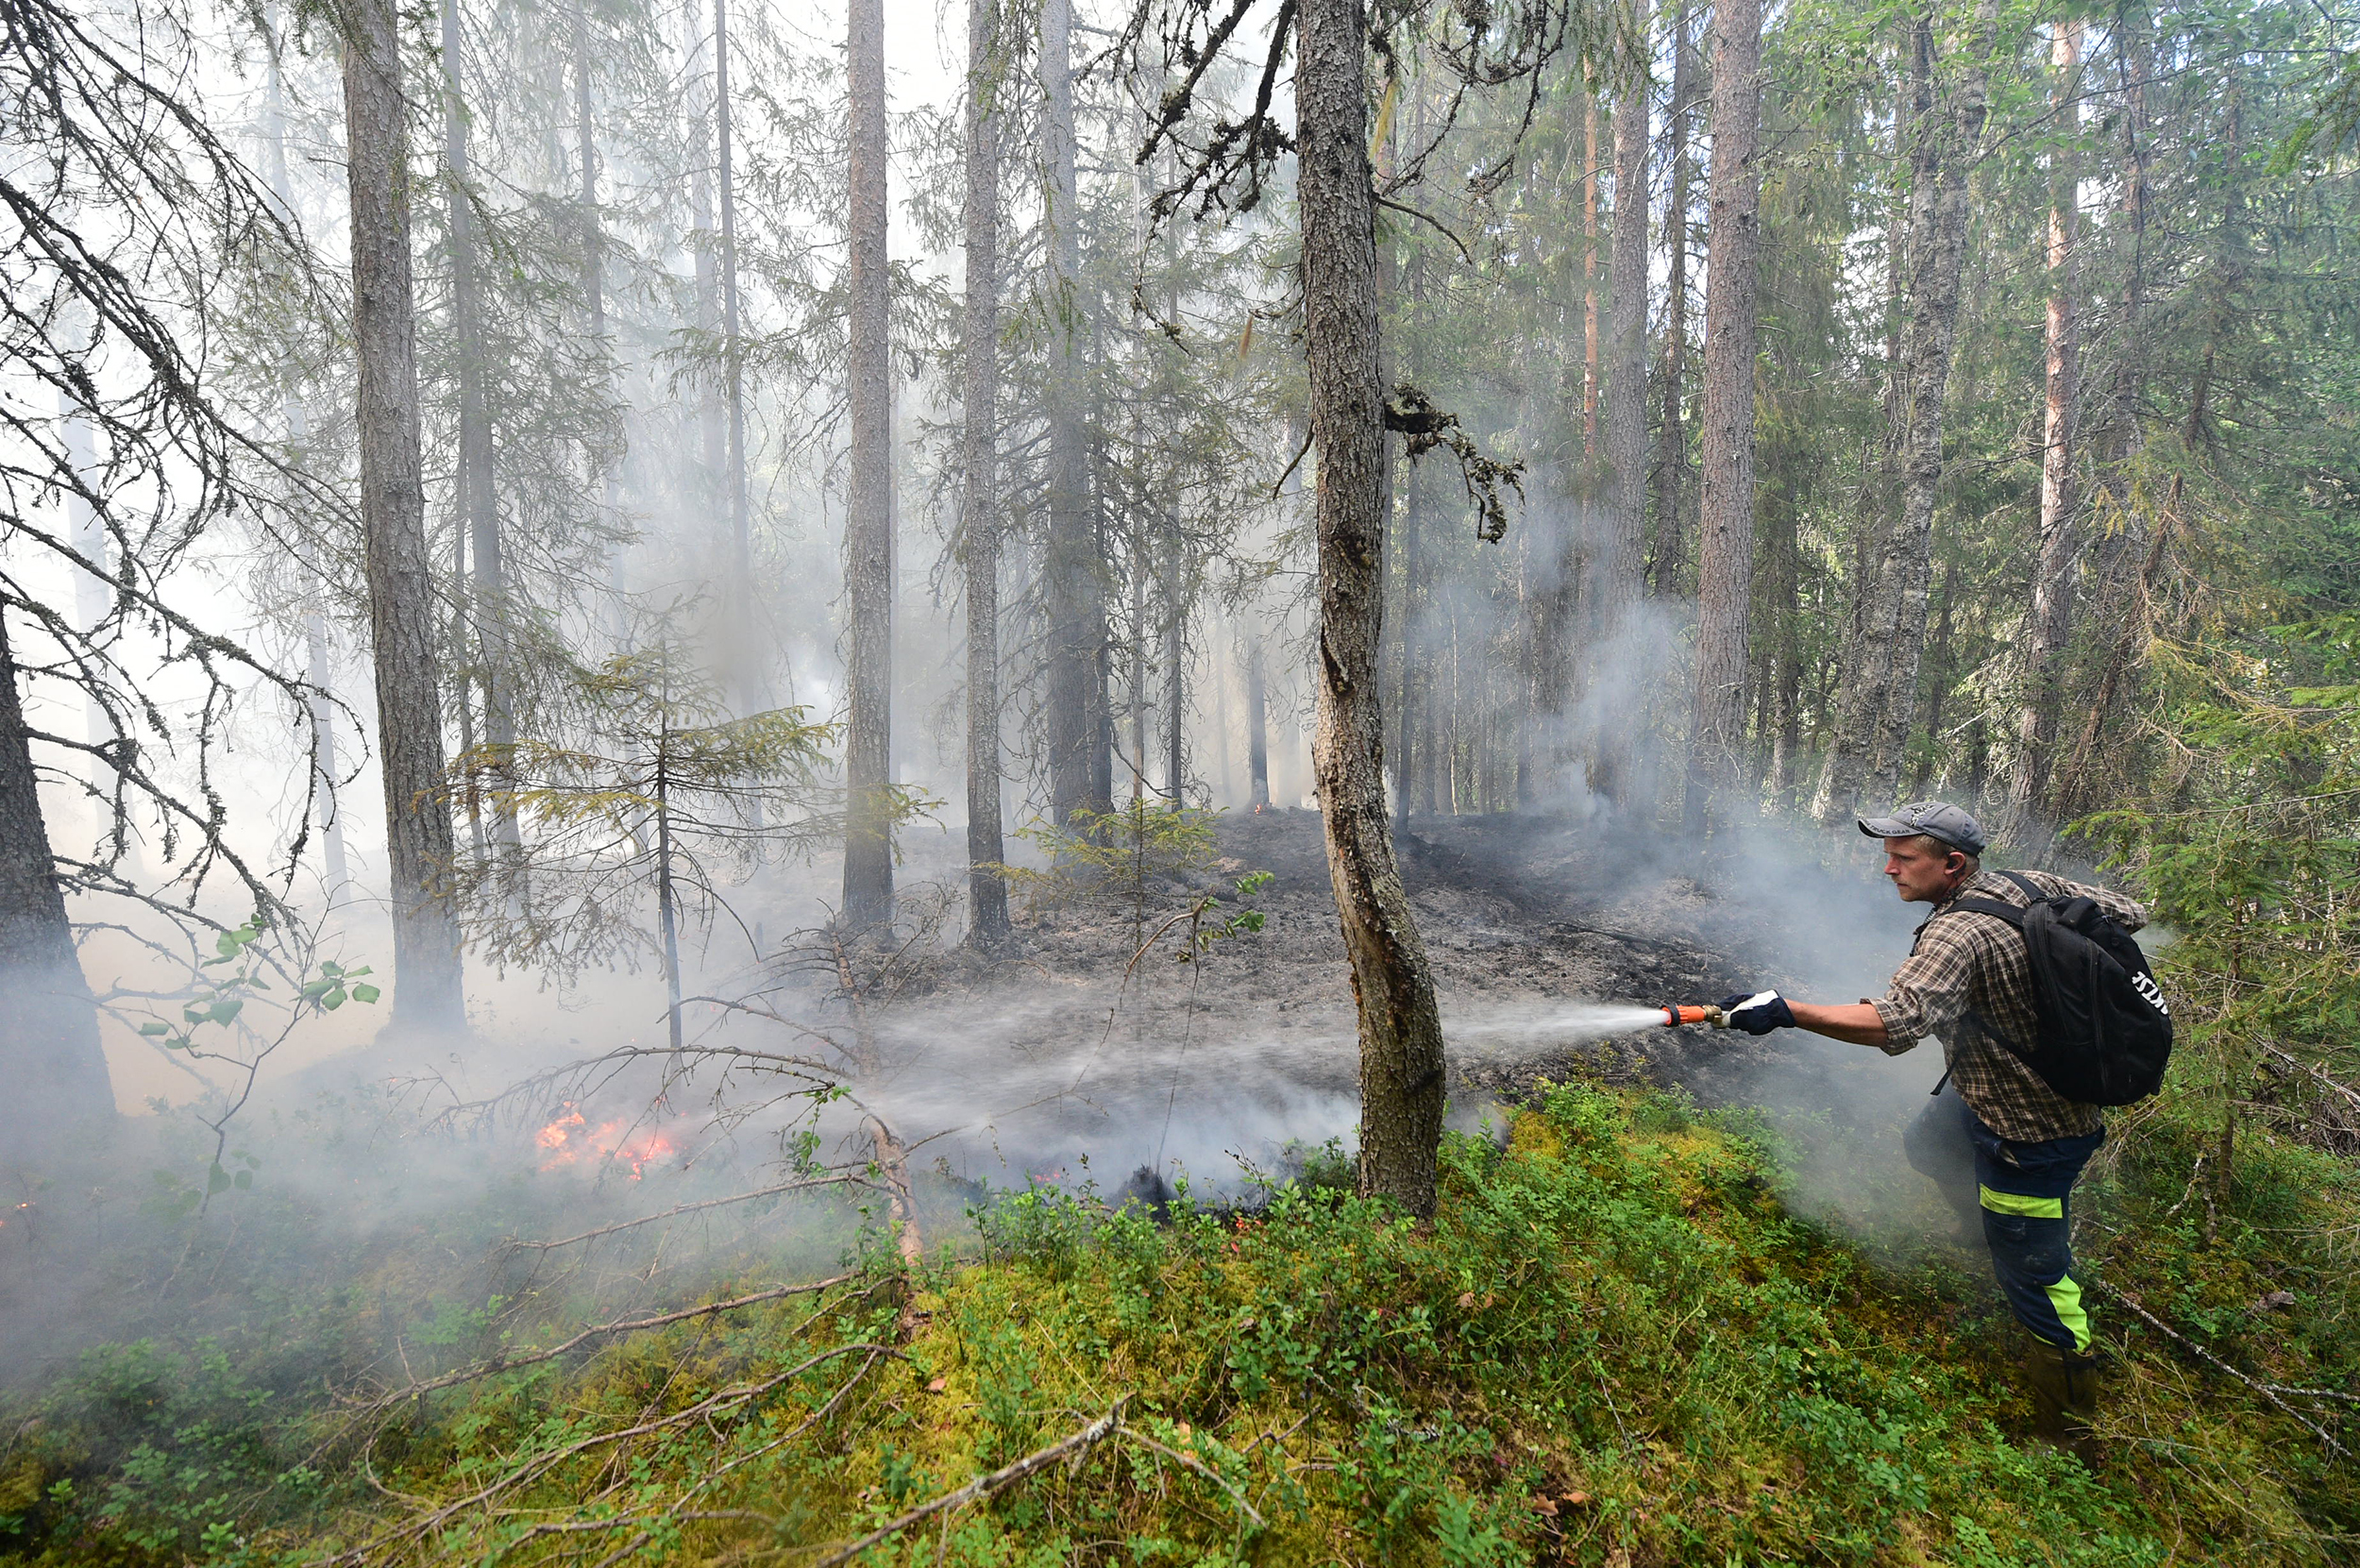 Skogsbranden dag for